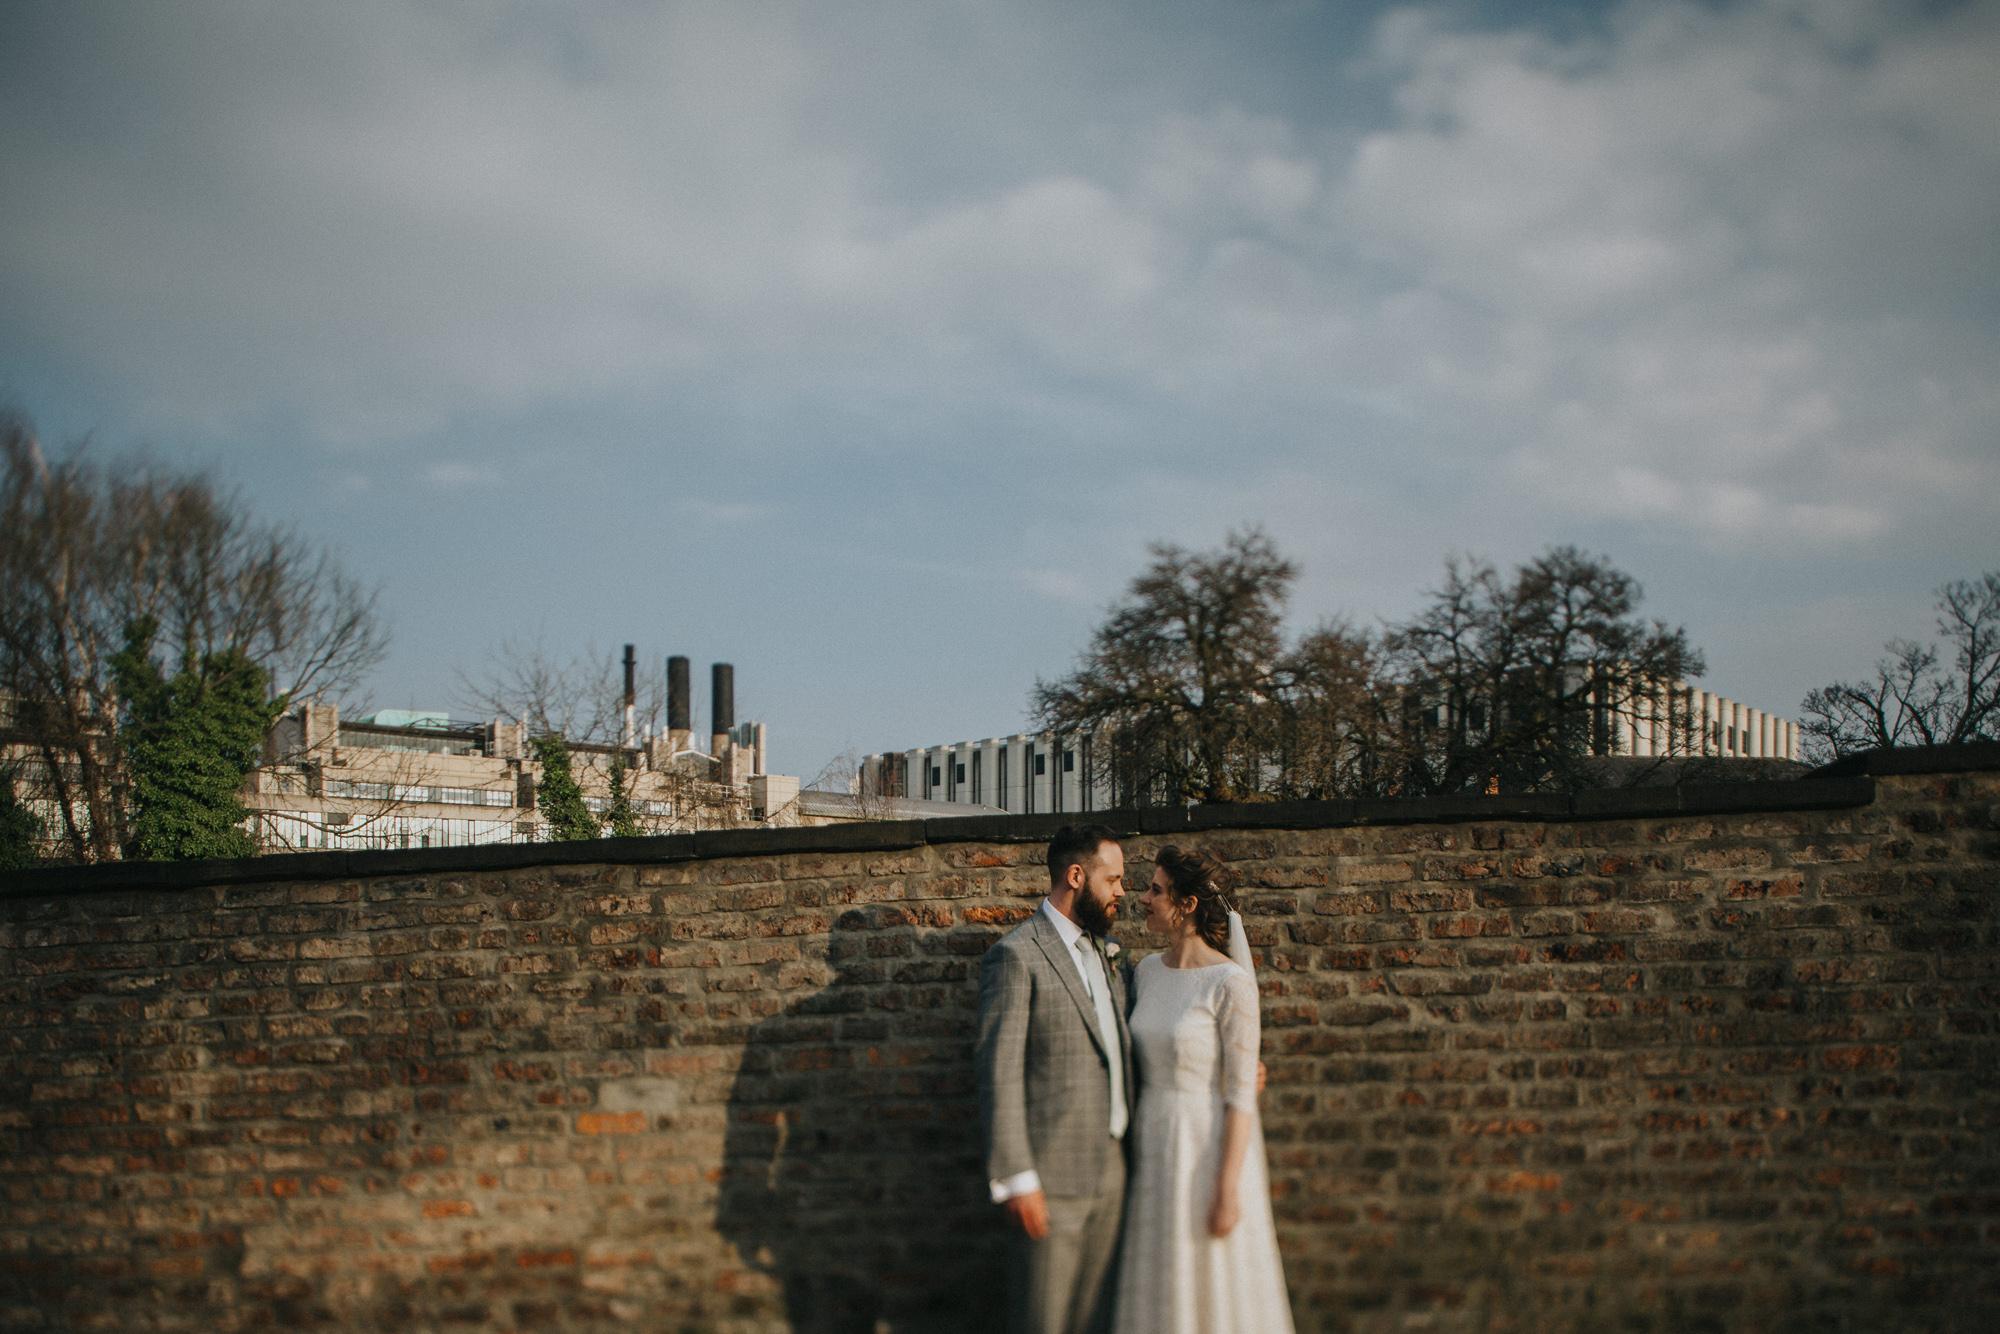 Kate-Beaumont-Lace-Flared-Dahlia-Gown-Leeds-Wedding-Bloom-Weddings-51.jpg